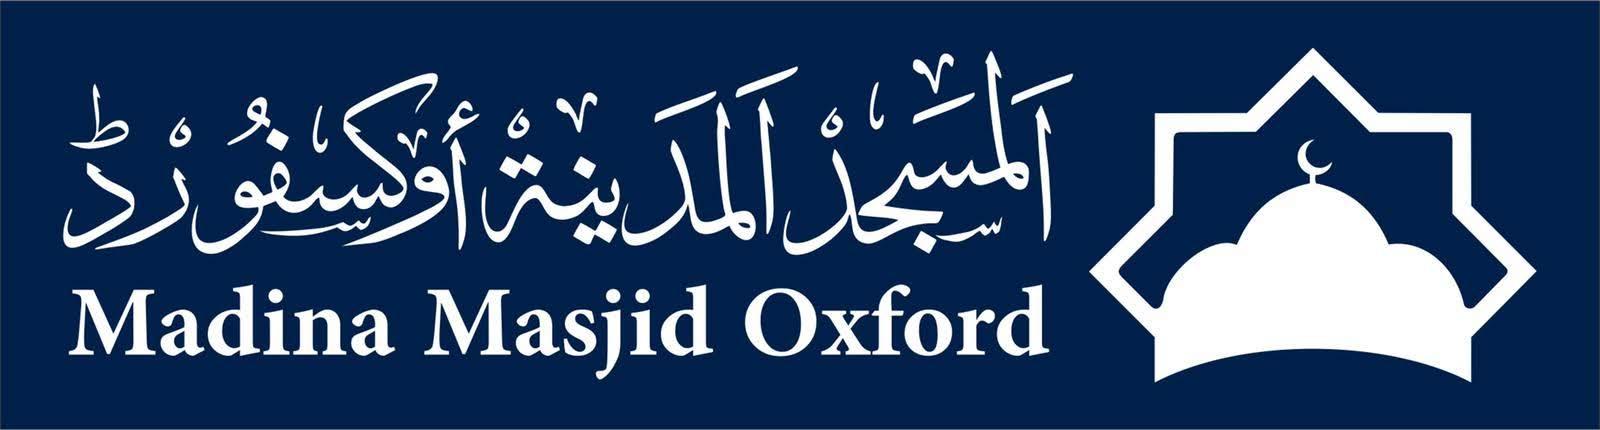 Madina Masjid Oxford